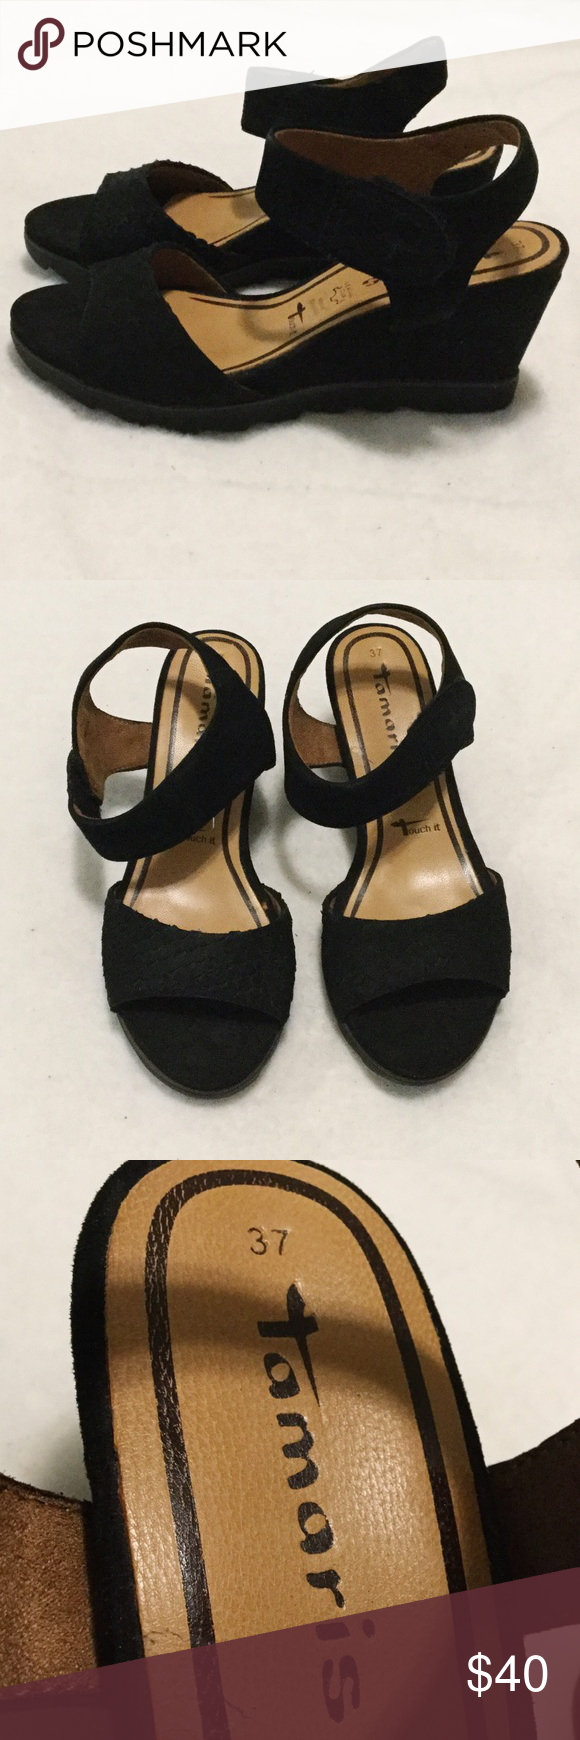 Tamaris Black Nubuck Leather Wedge Sandals Tamaris black